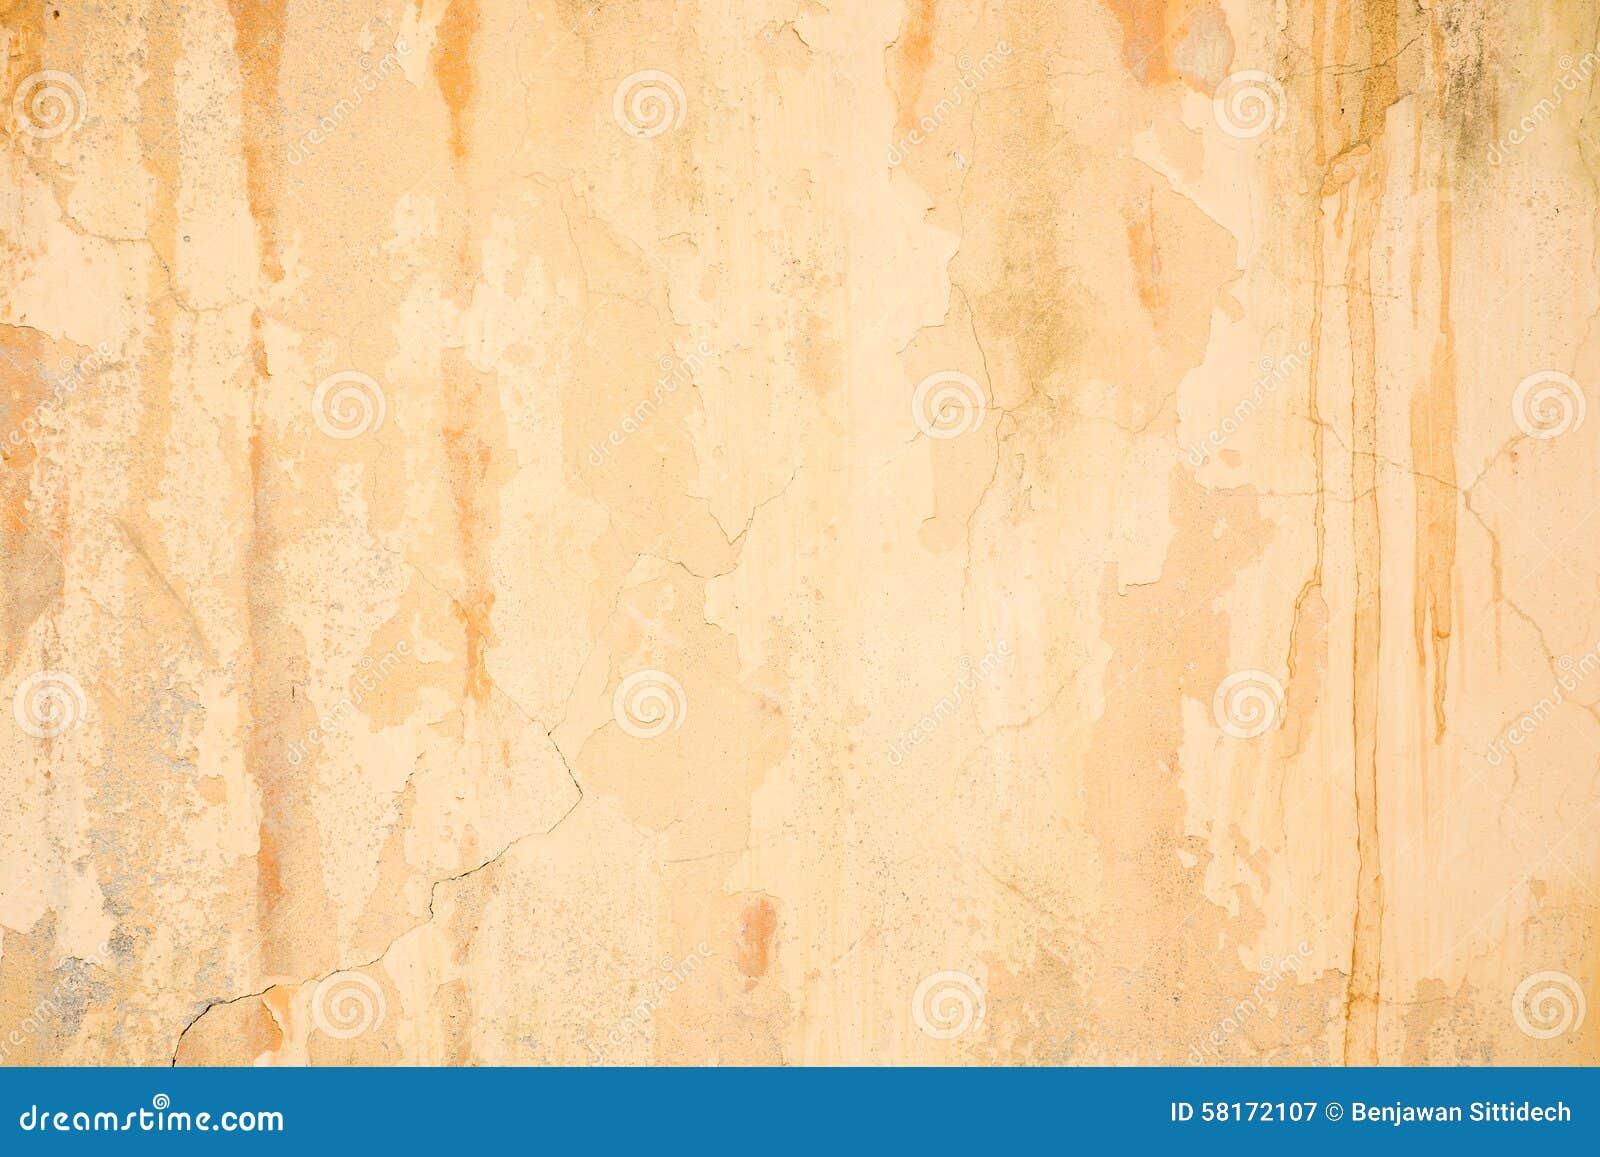 Orange Cement Wall : Old grunge cracked orange concrete wall stock image